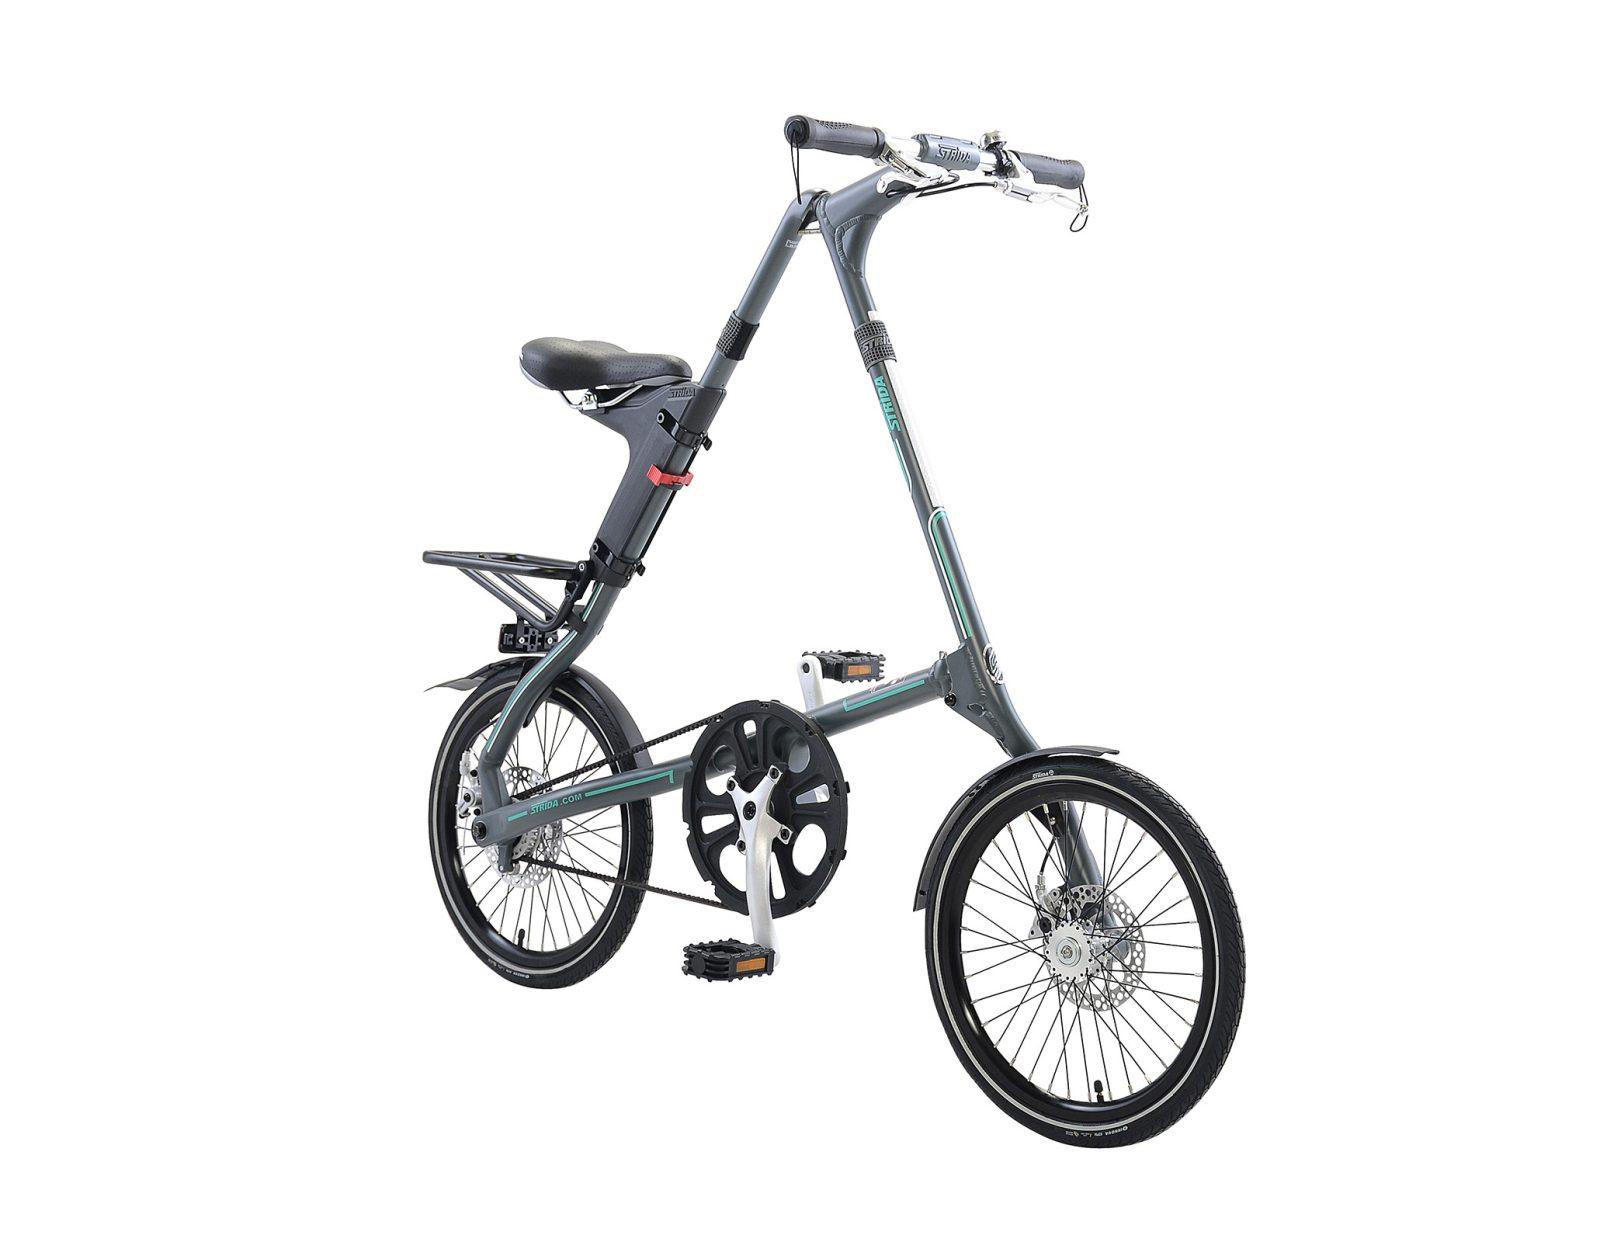 STRiDA SX Folding Bicycle, Grey-31747